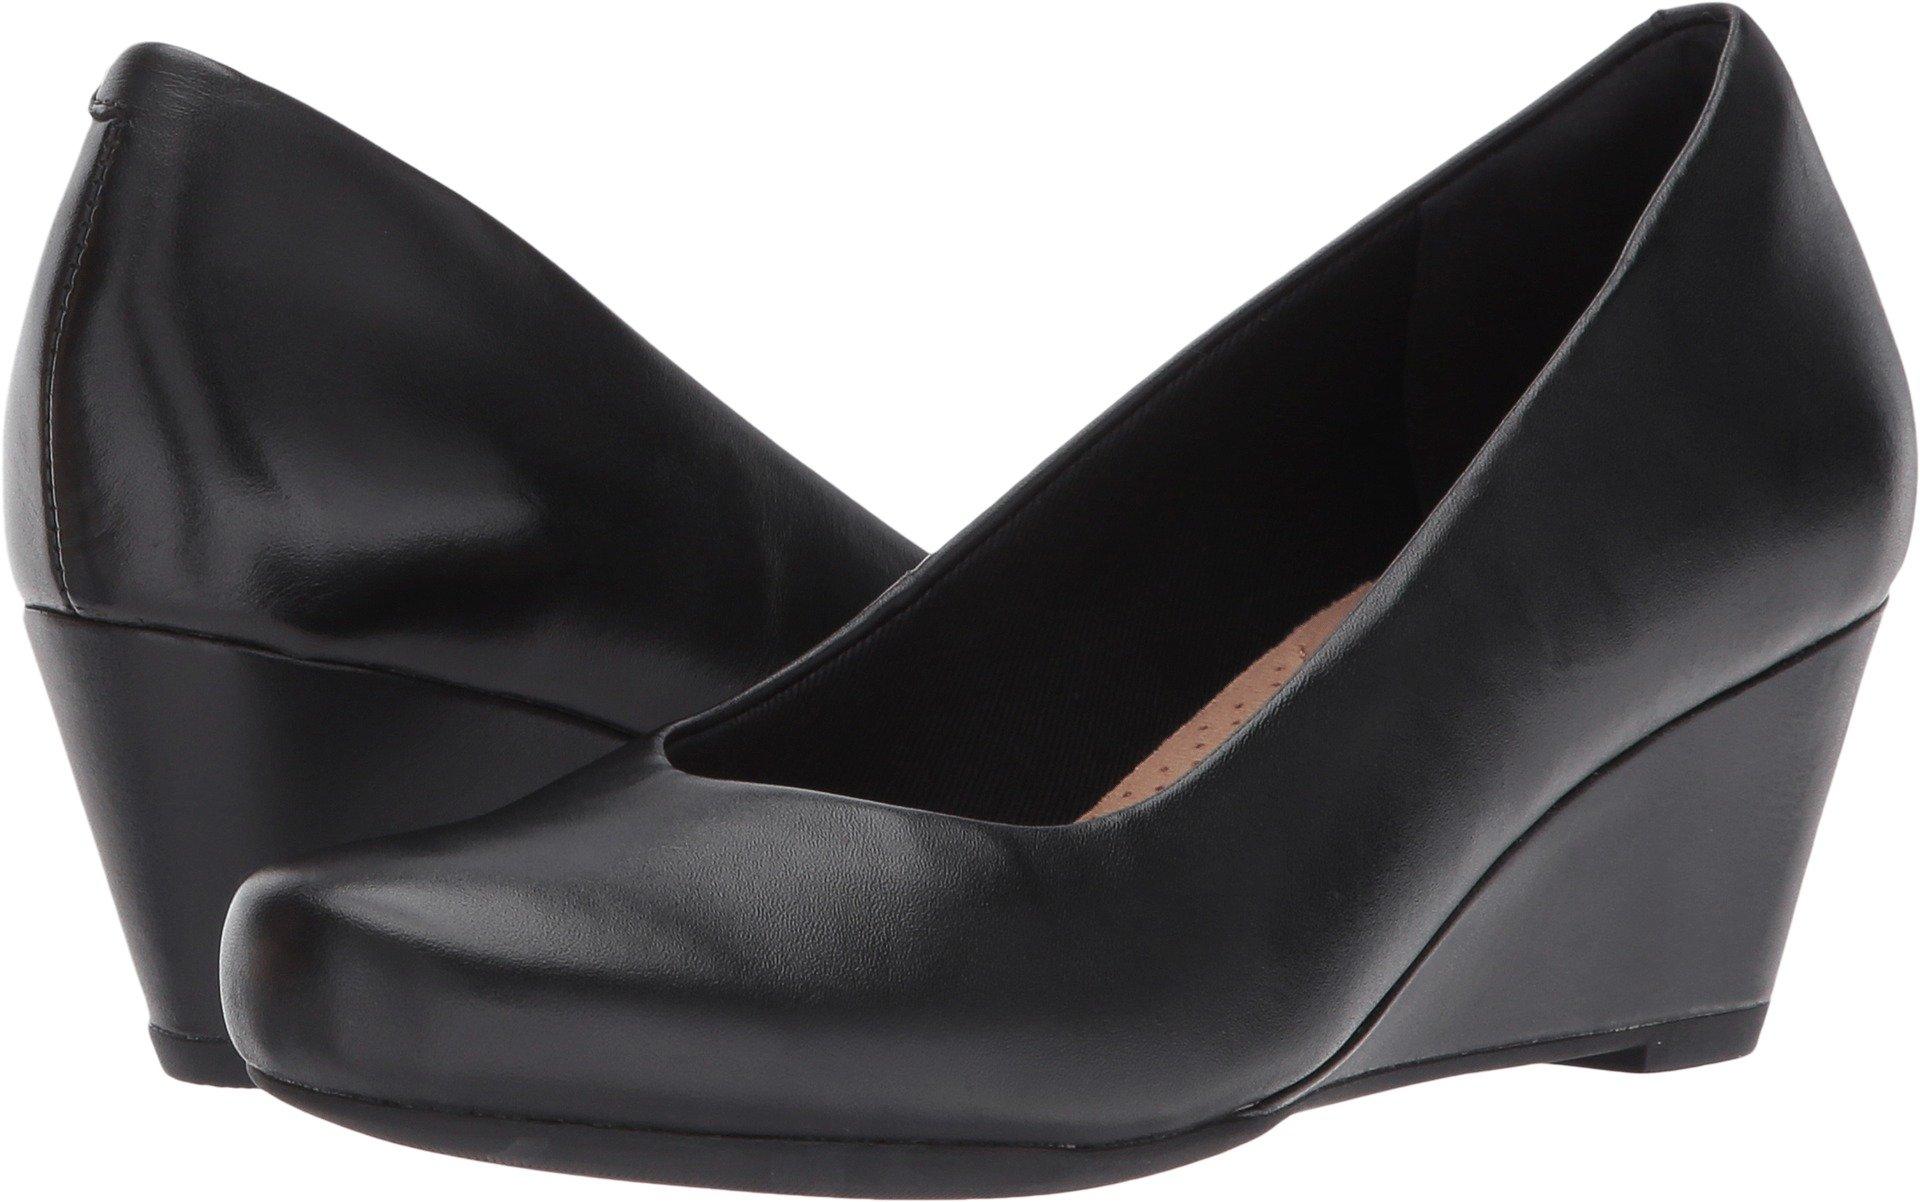 Clarks Women's Flores Tulip Wedge Pump,Black Leather,6.5 M US